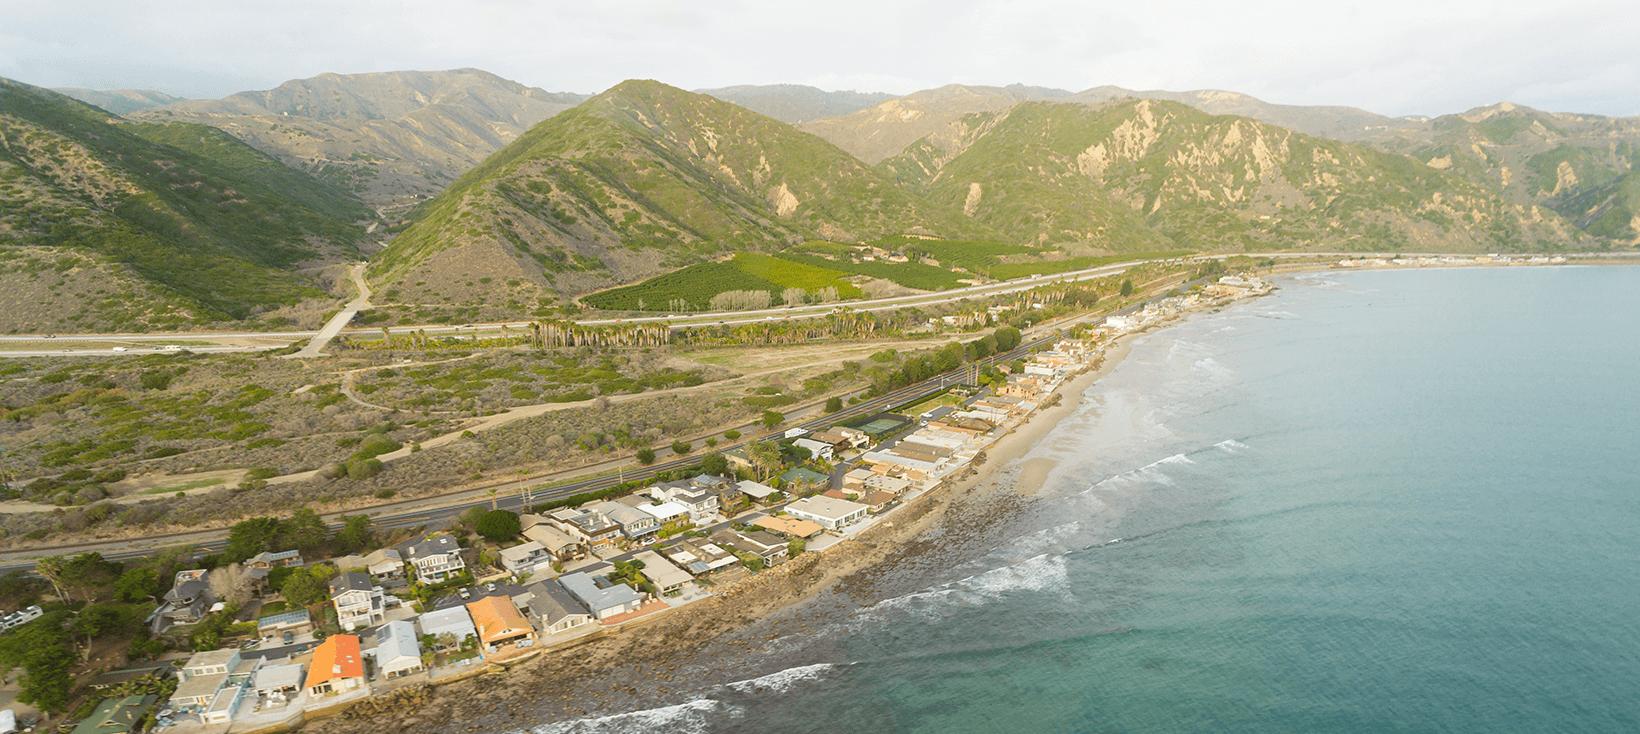 Santa Barbara Coastline, California